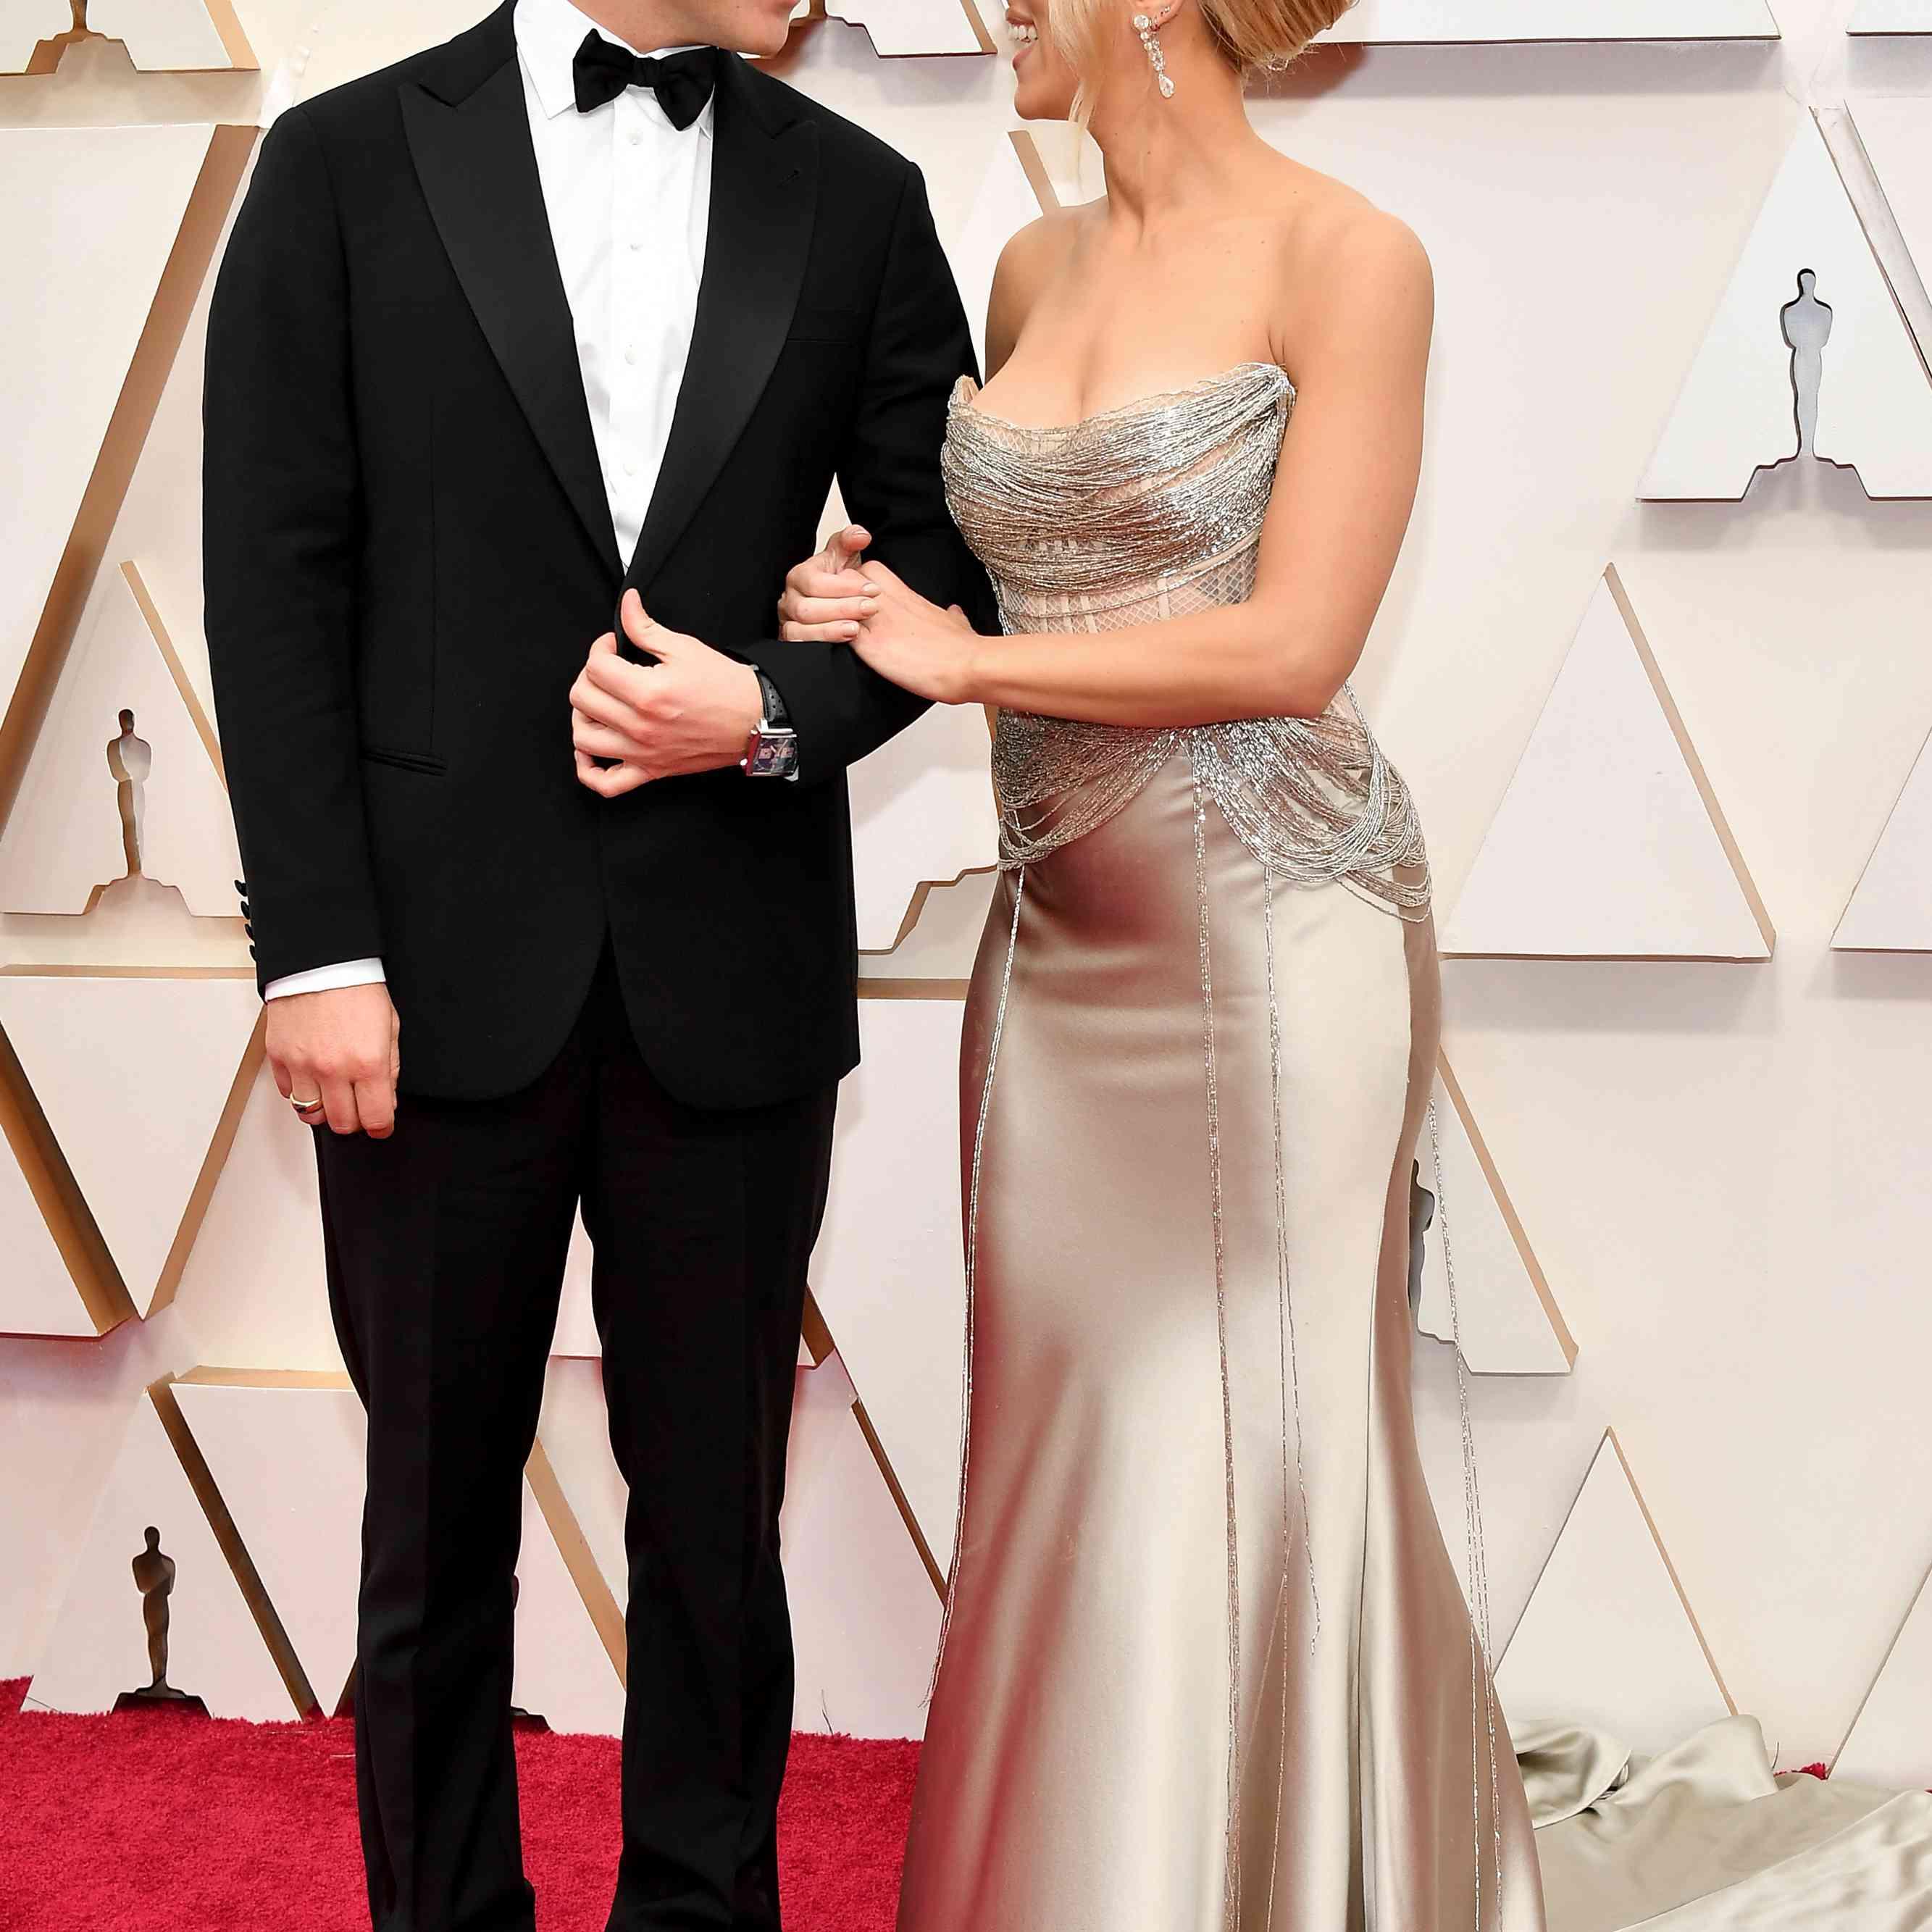 Colin Jost and Scarlett Johansson The Oscars